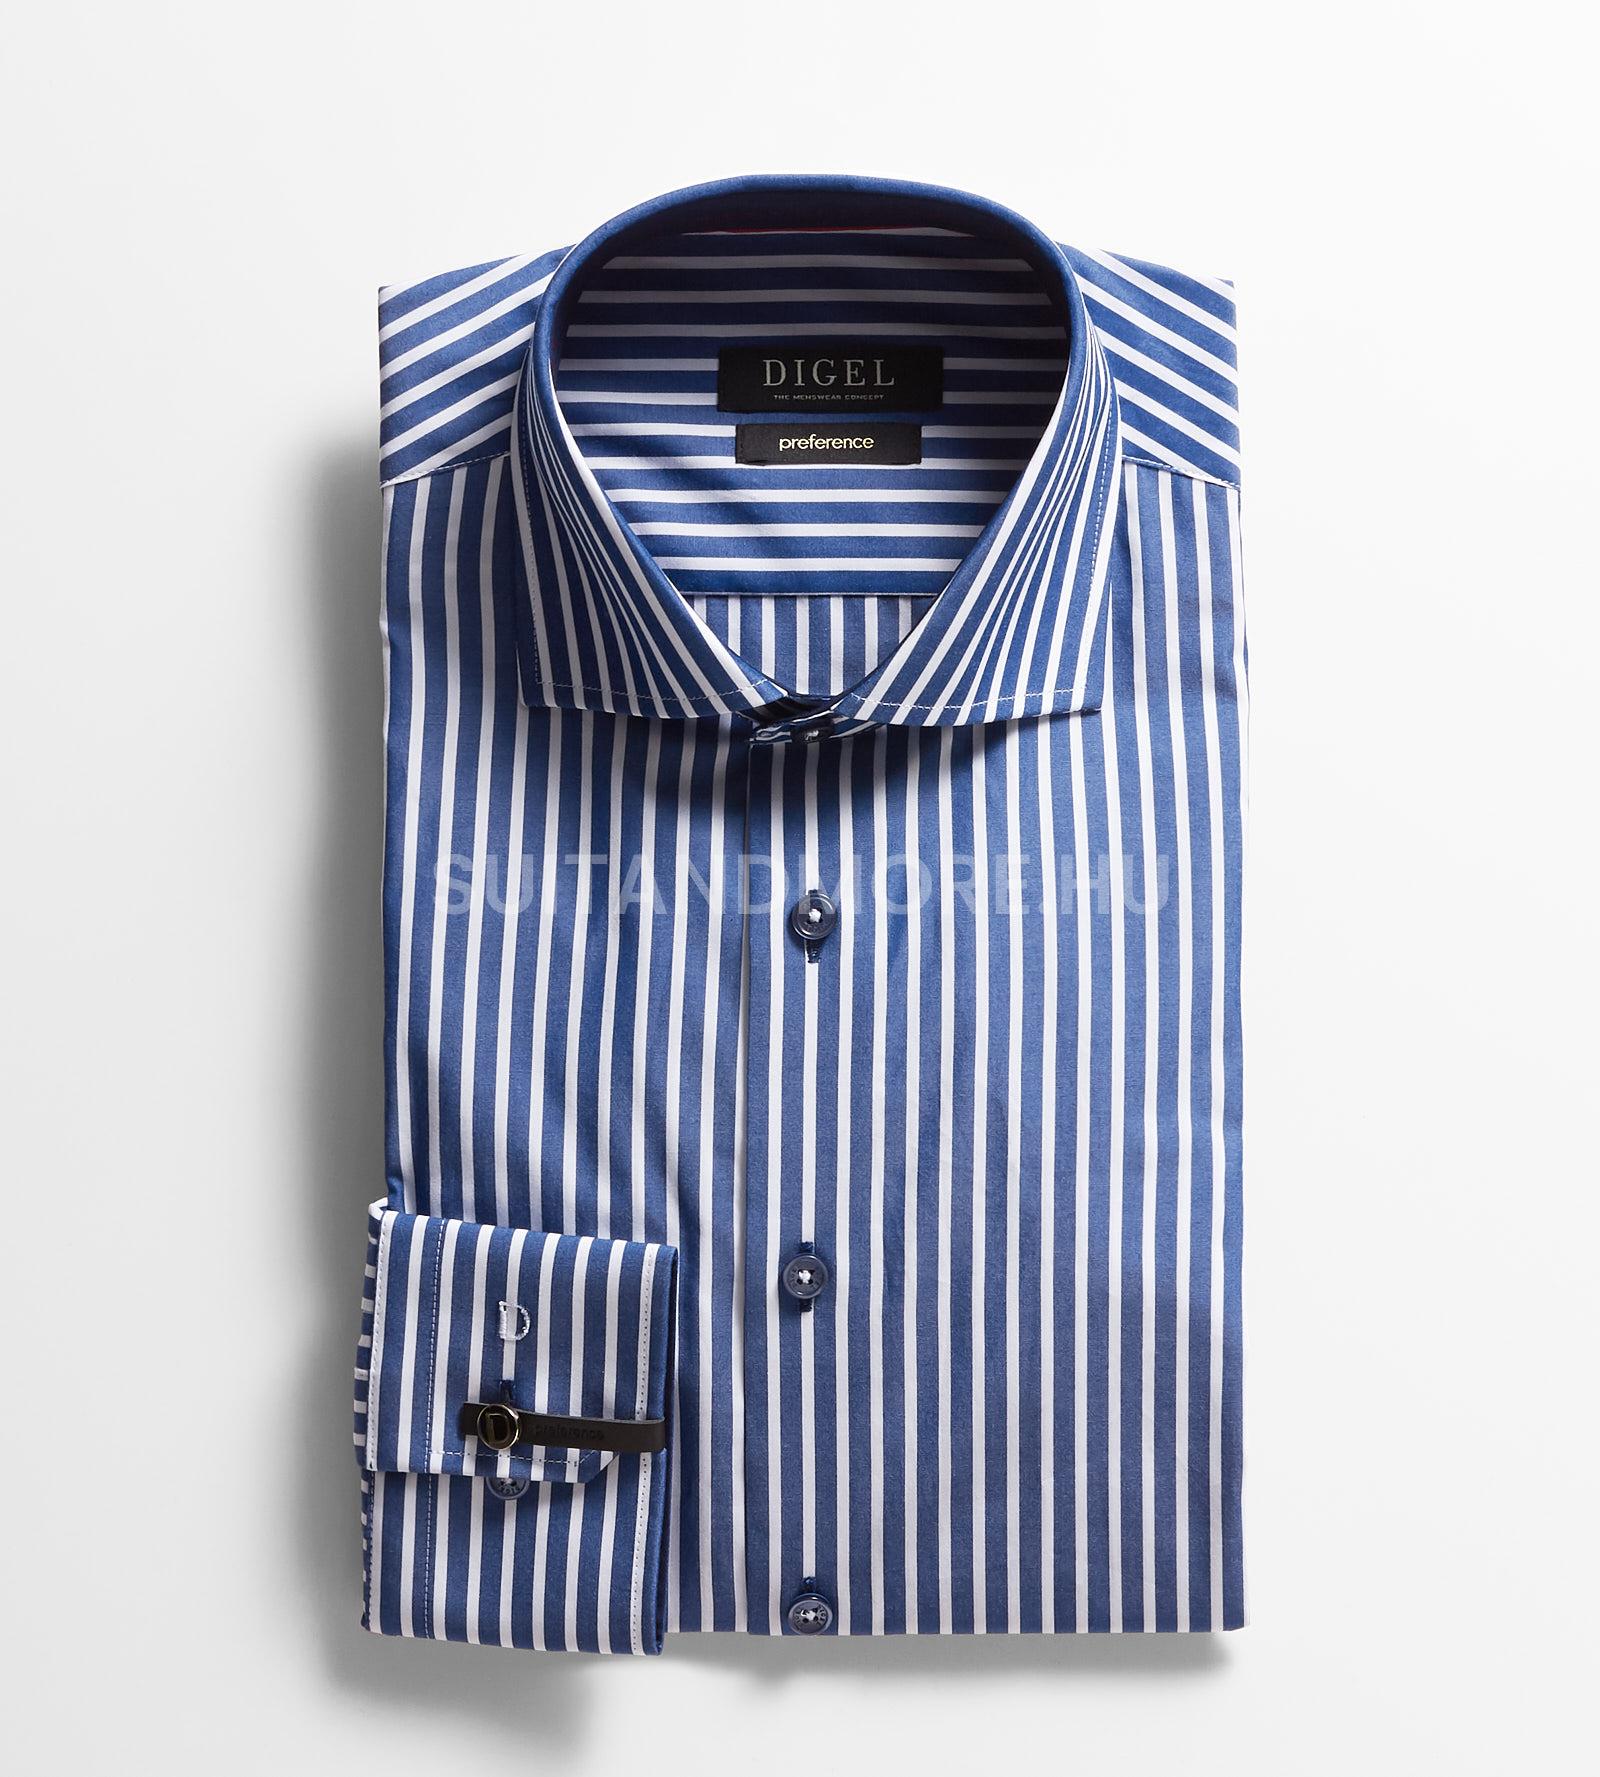 DIGEL-kék-modern-fit-csíkos-ing-DANTOS-B-1-1-1187060-22-01